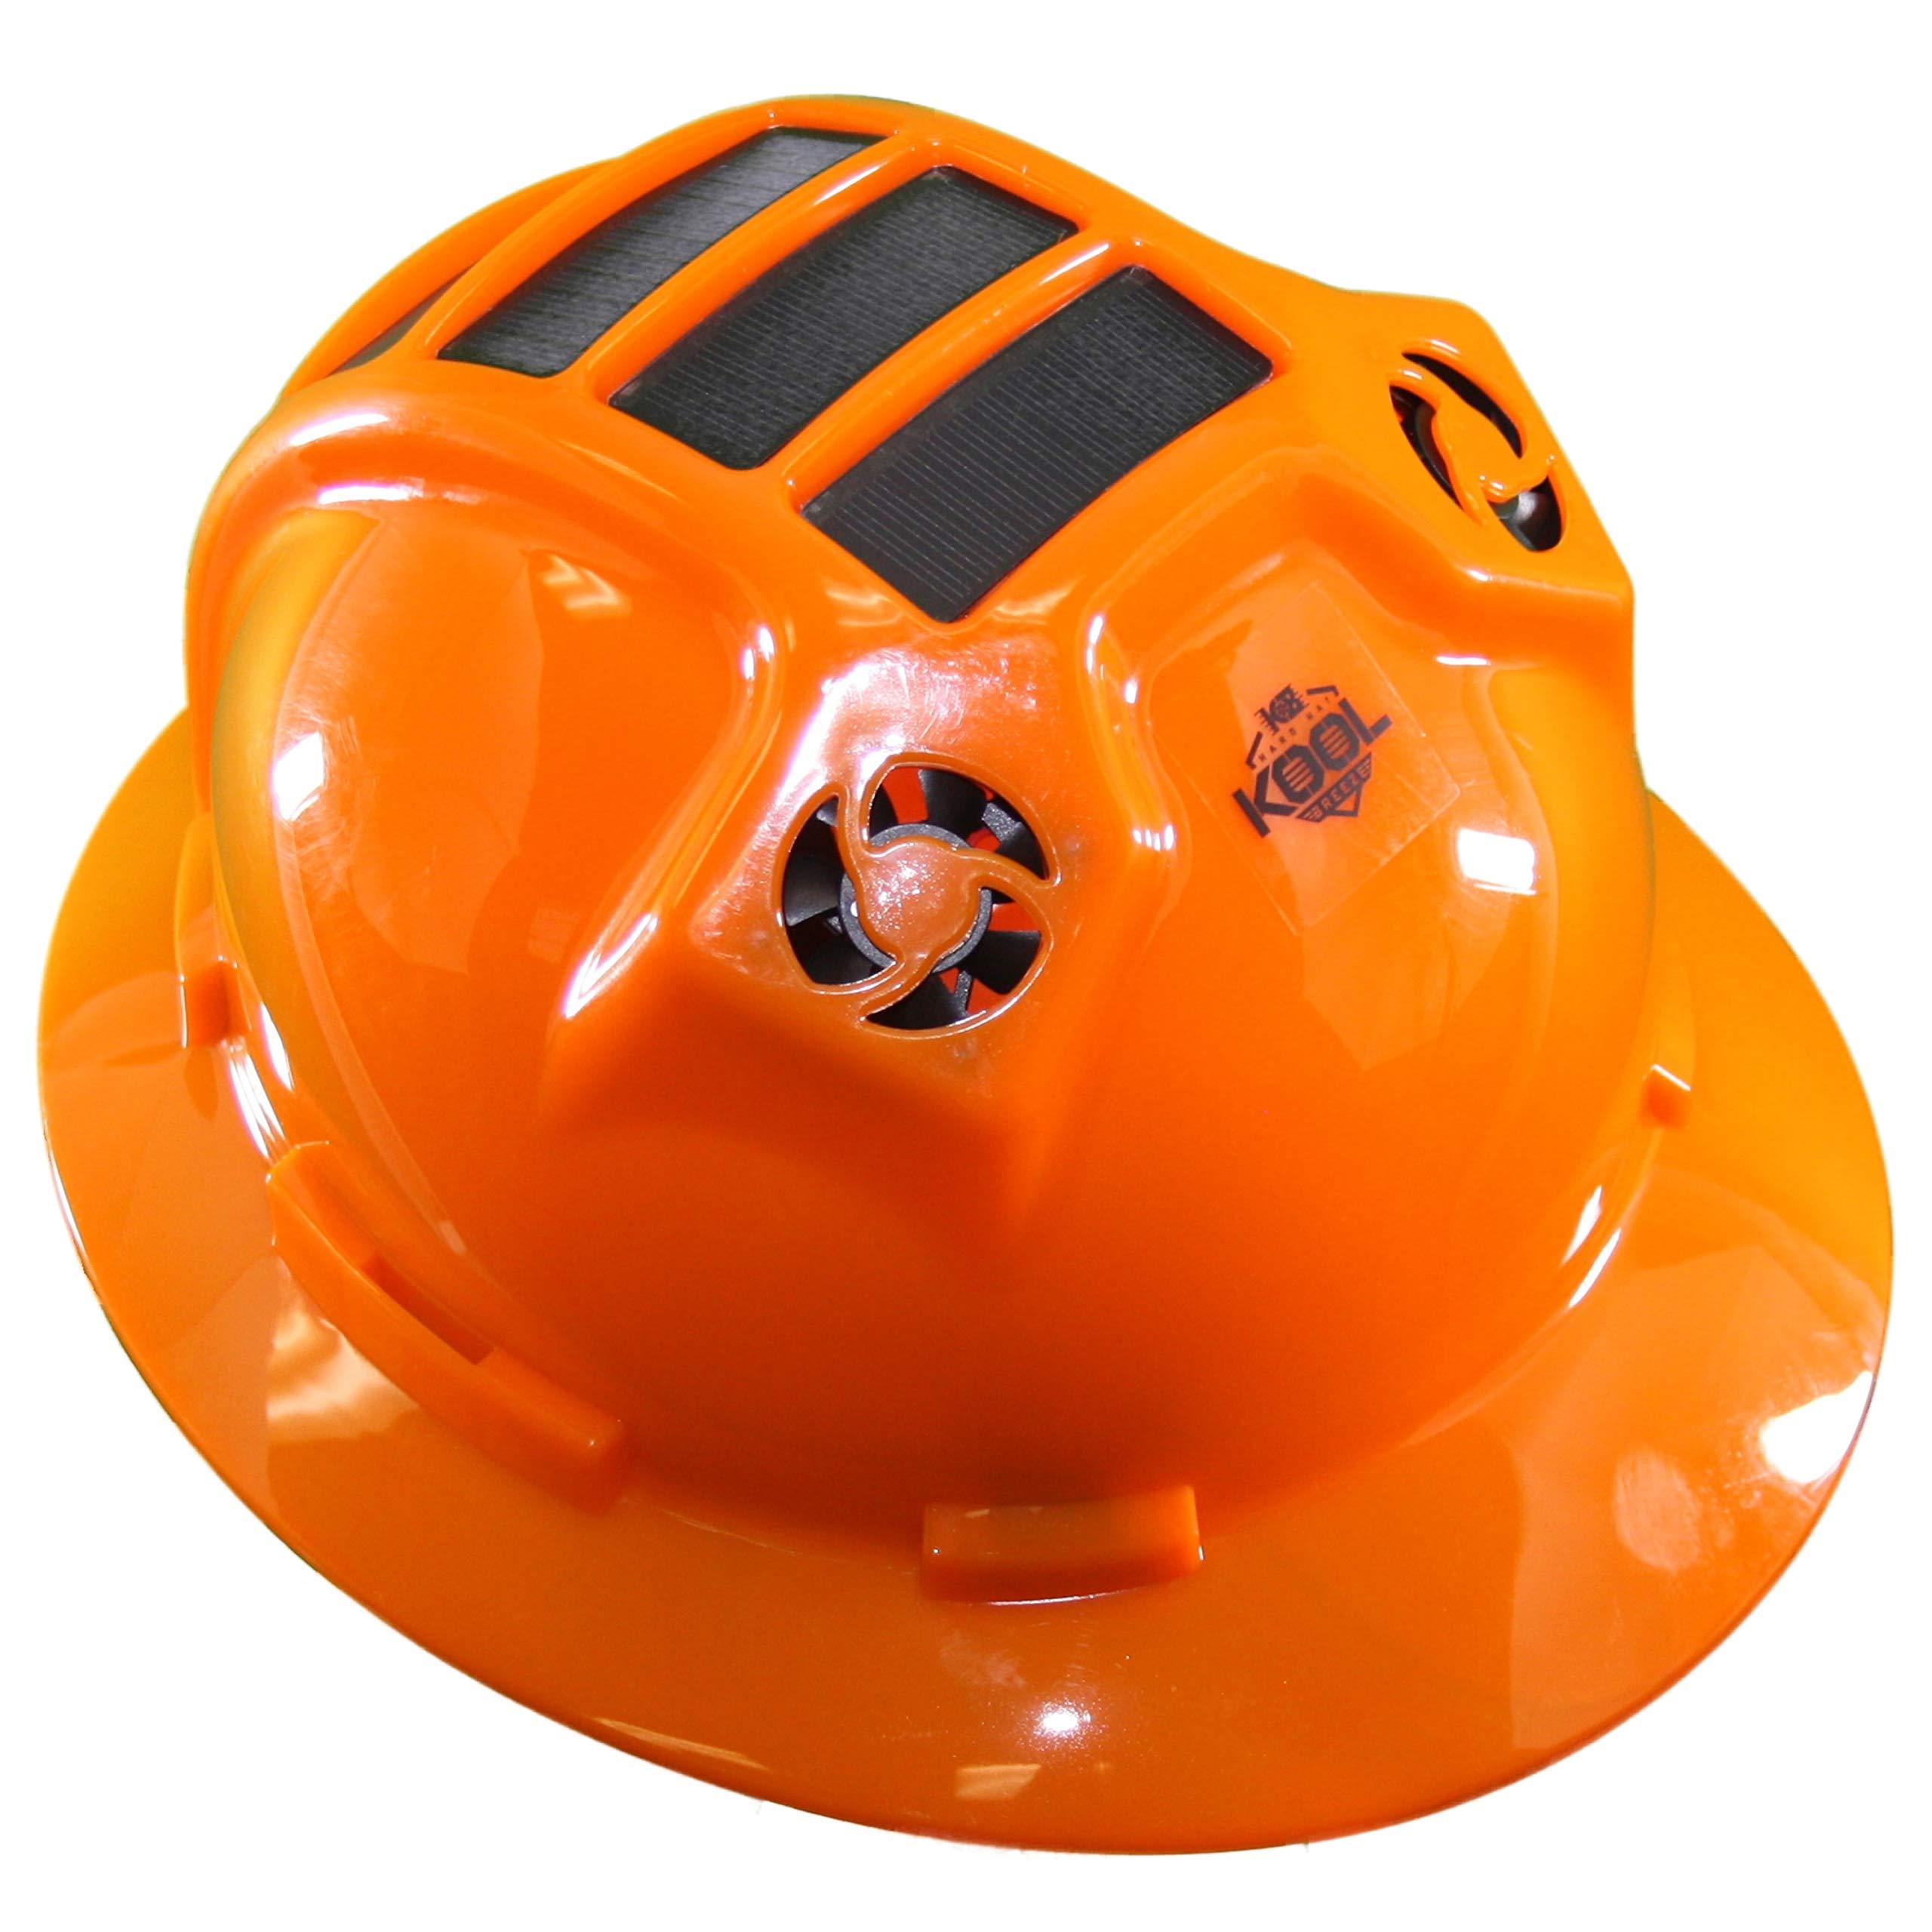 Hard Hat Head Protection Kool Breeze Solar Helmet With Rechargeable Battery and Adjustable Ratchet Suspension (Orange) by Kool Breeze Solar Hats (Image #1)